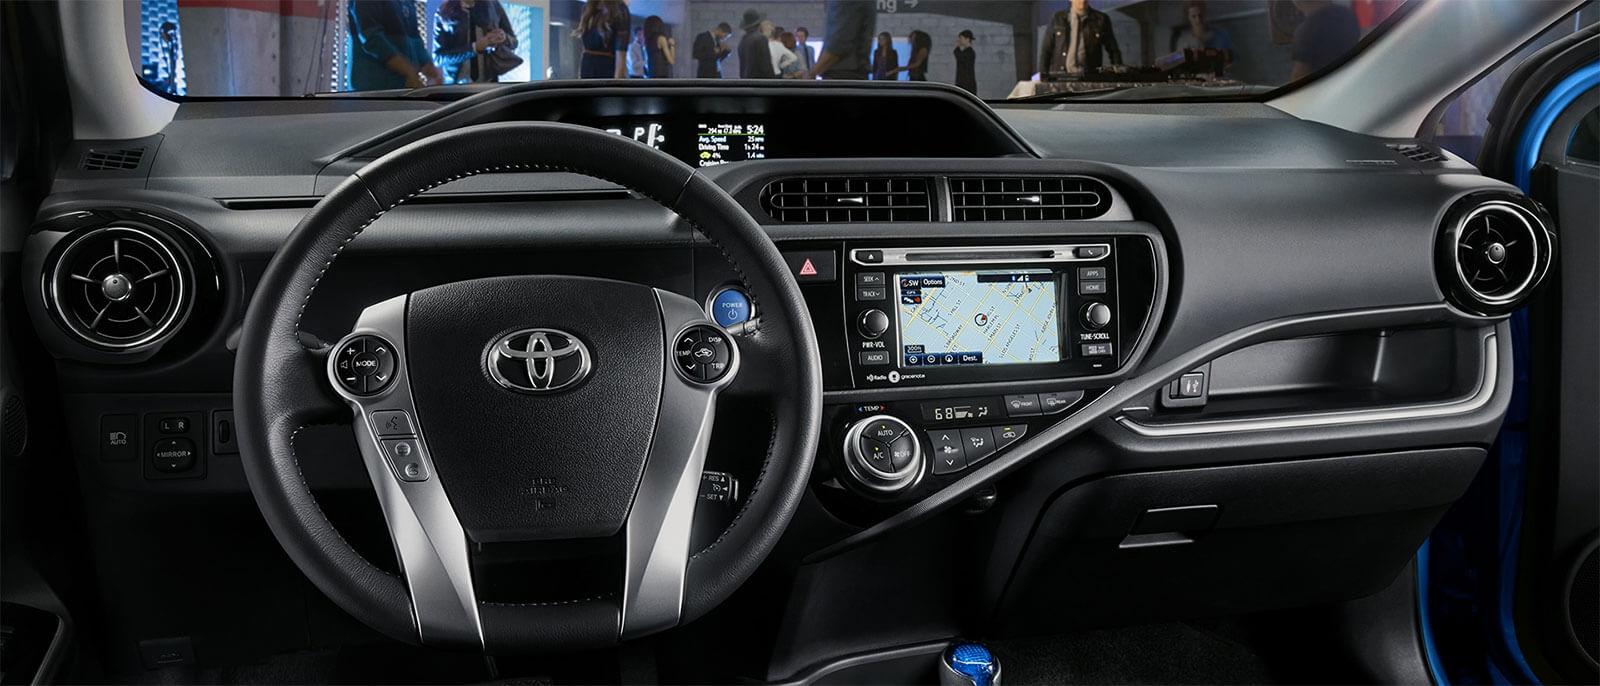 2017 Toyota Prius c interior dashboard view